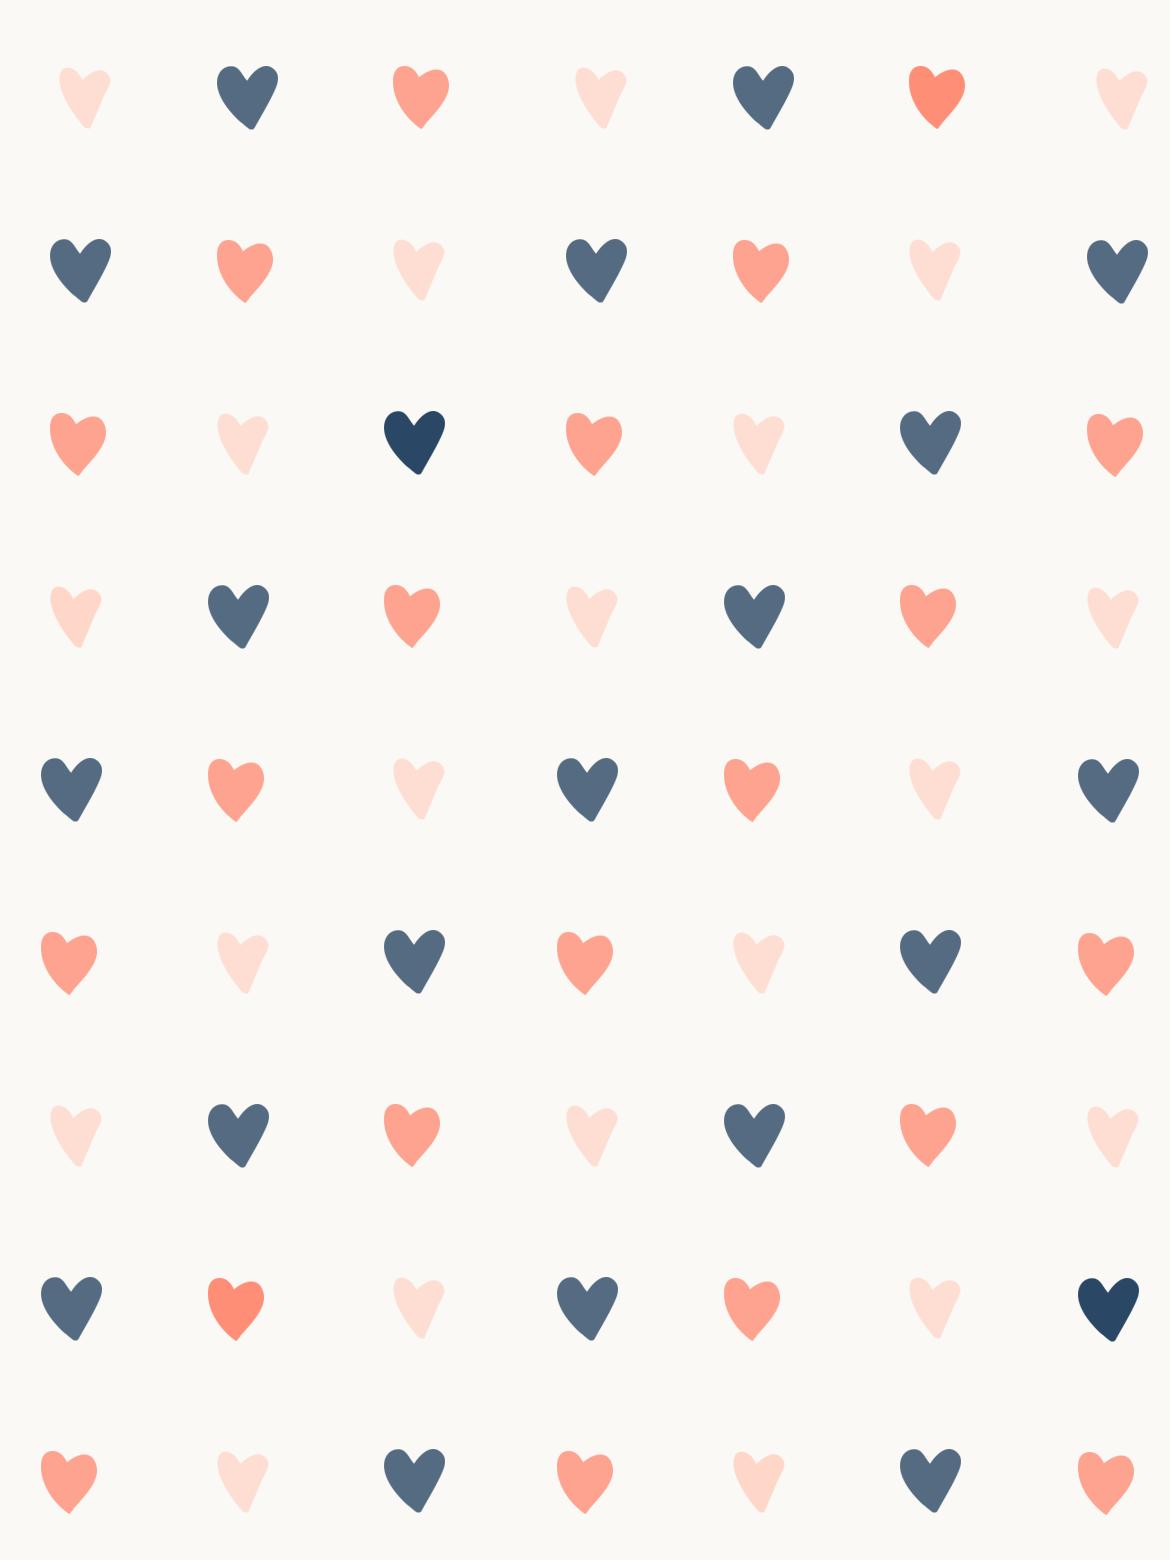 heartsbackgroundipod.png 1,170×1,560 pixels Heart